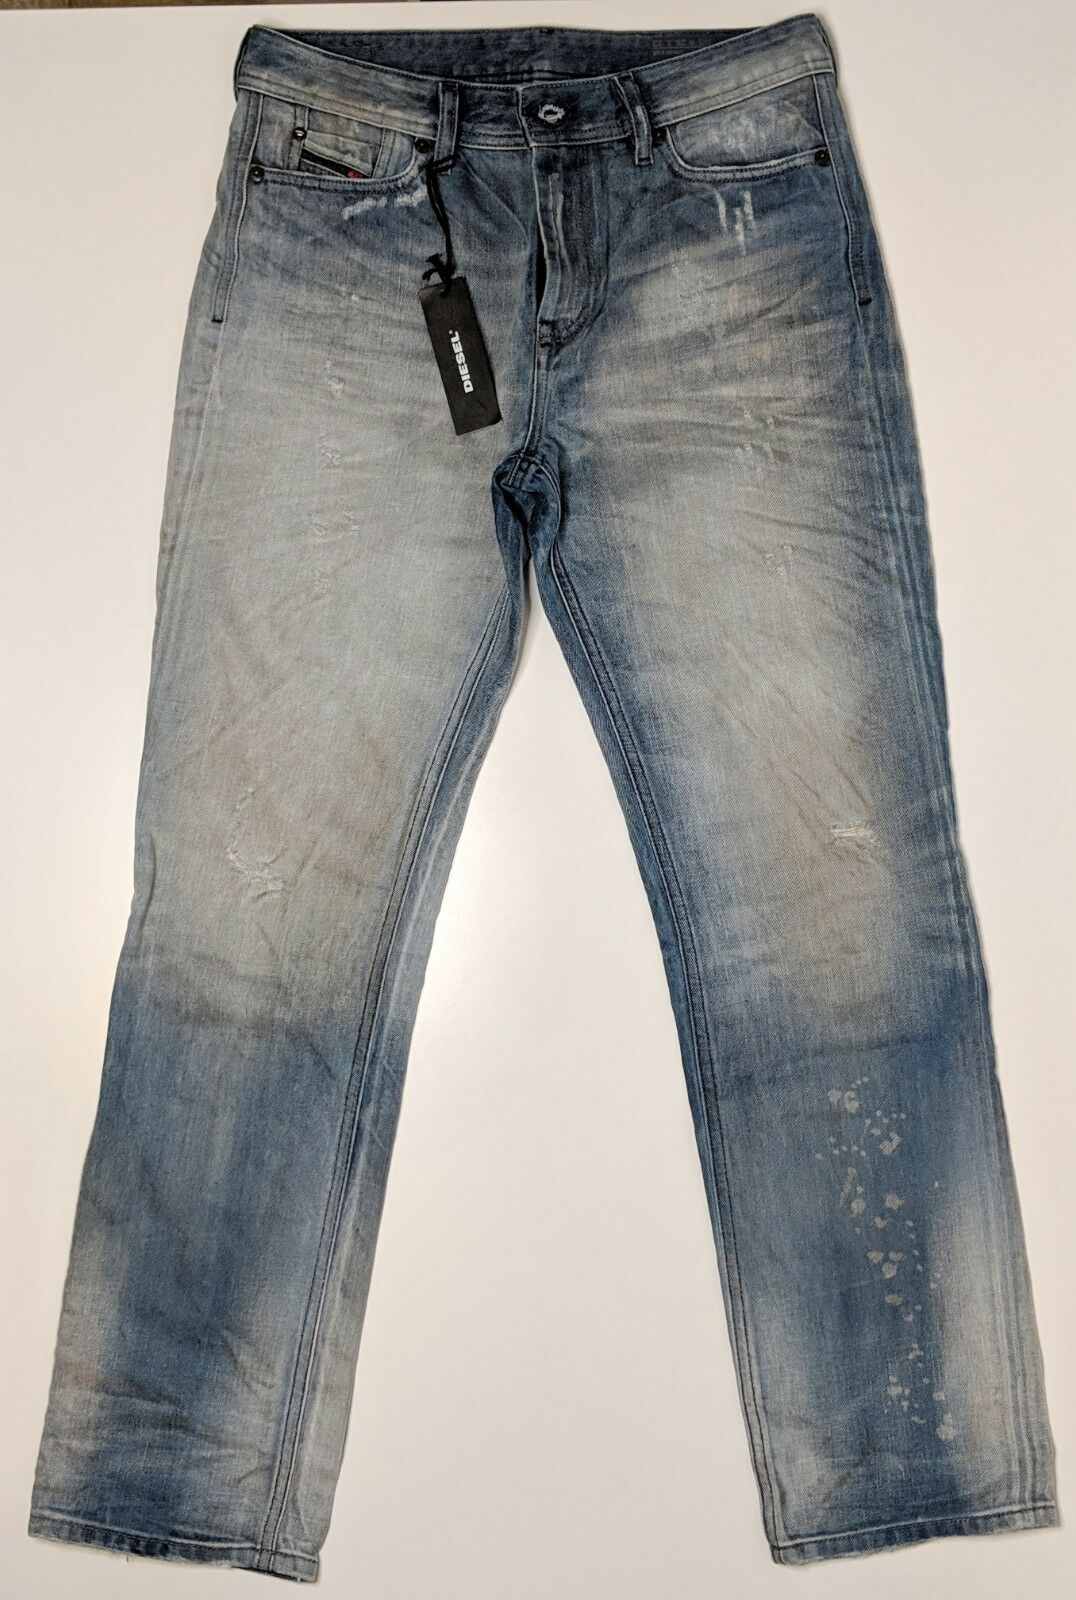 Diesel Mens bluee Reen Jeans. Size W28   L32. Brand New. Distressed look.